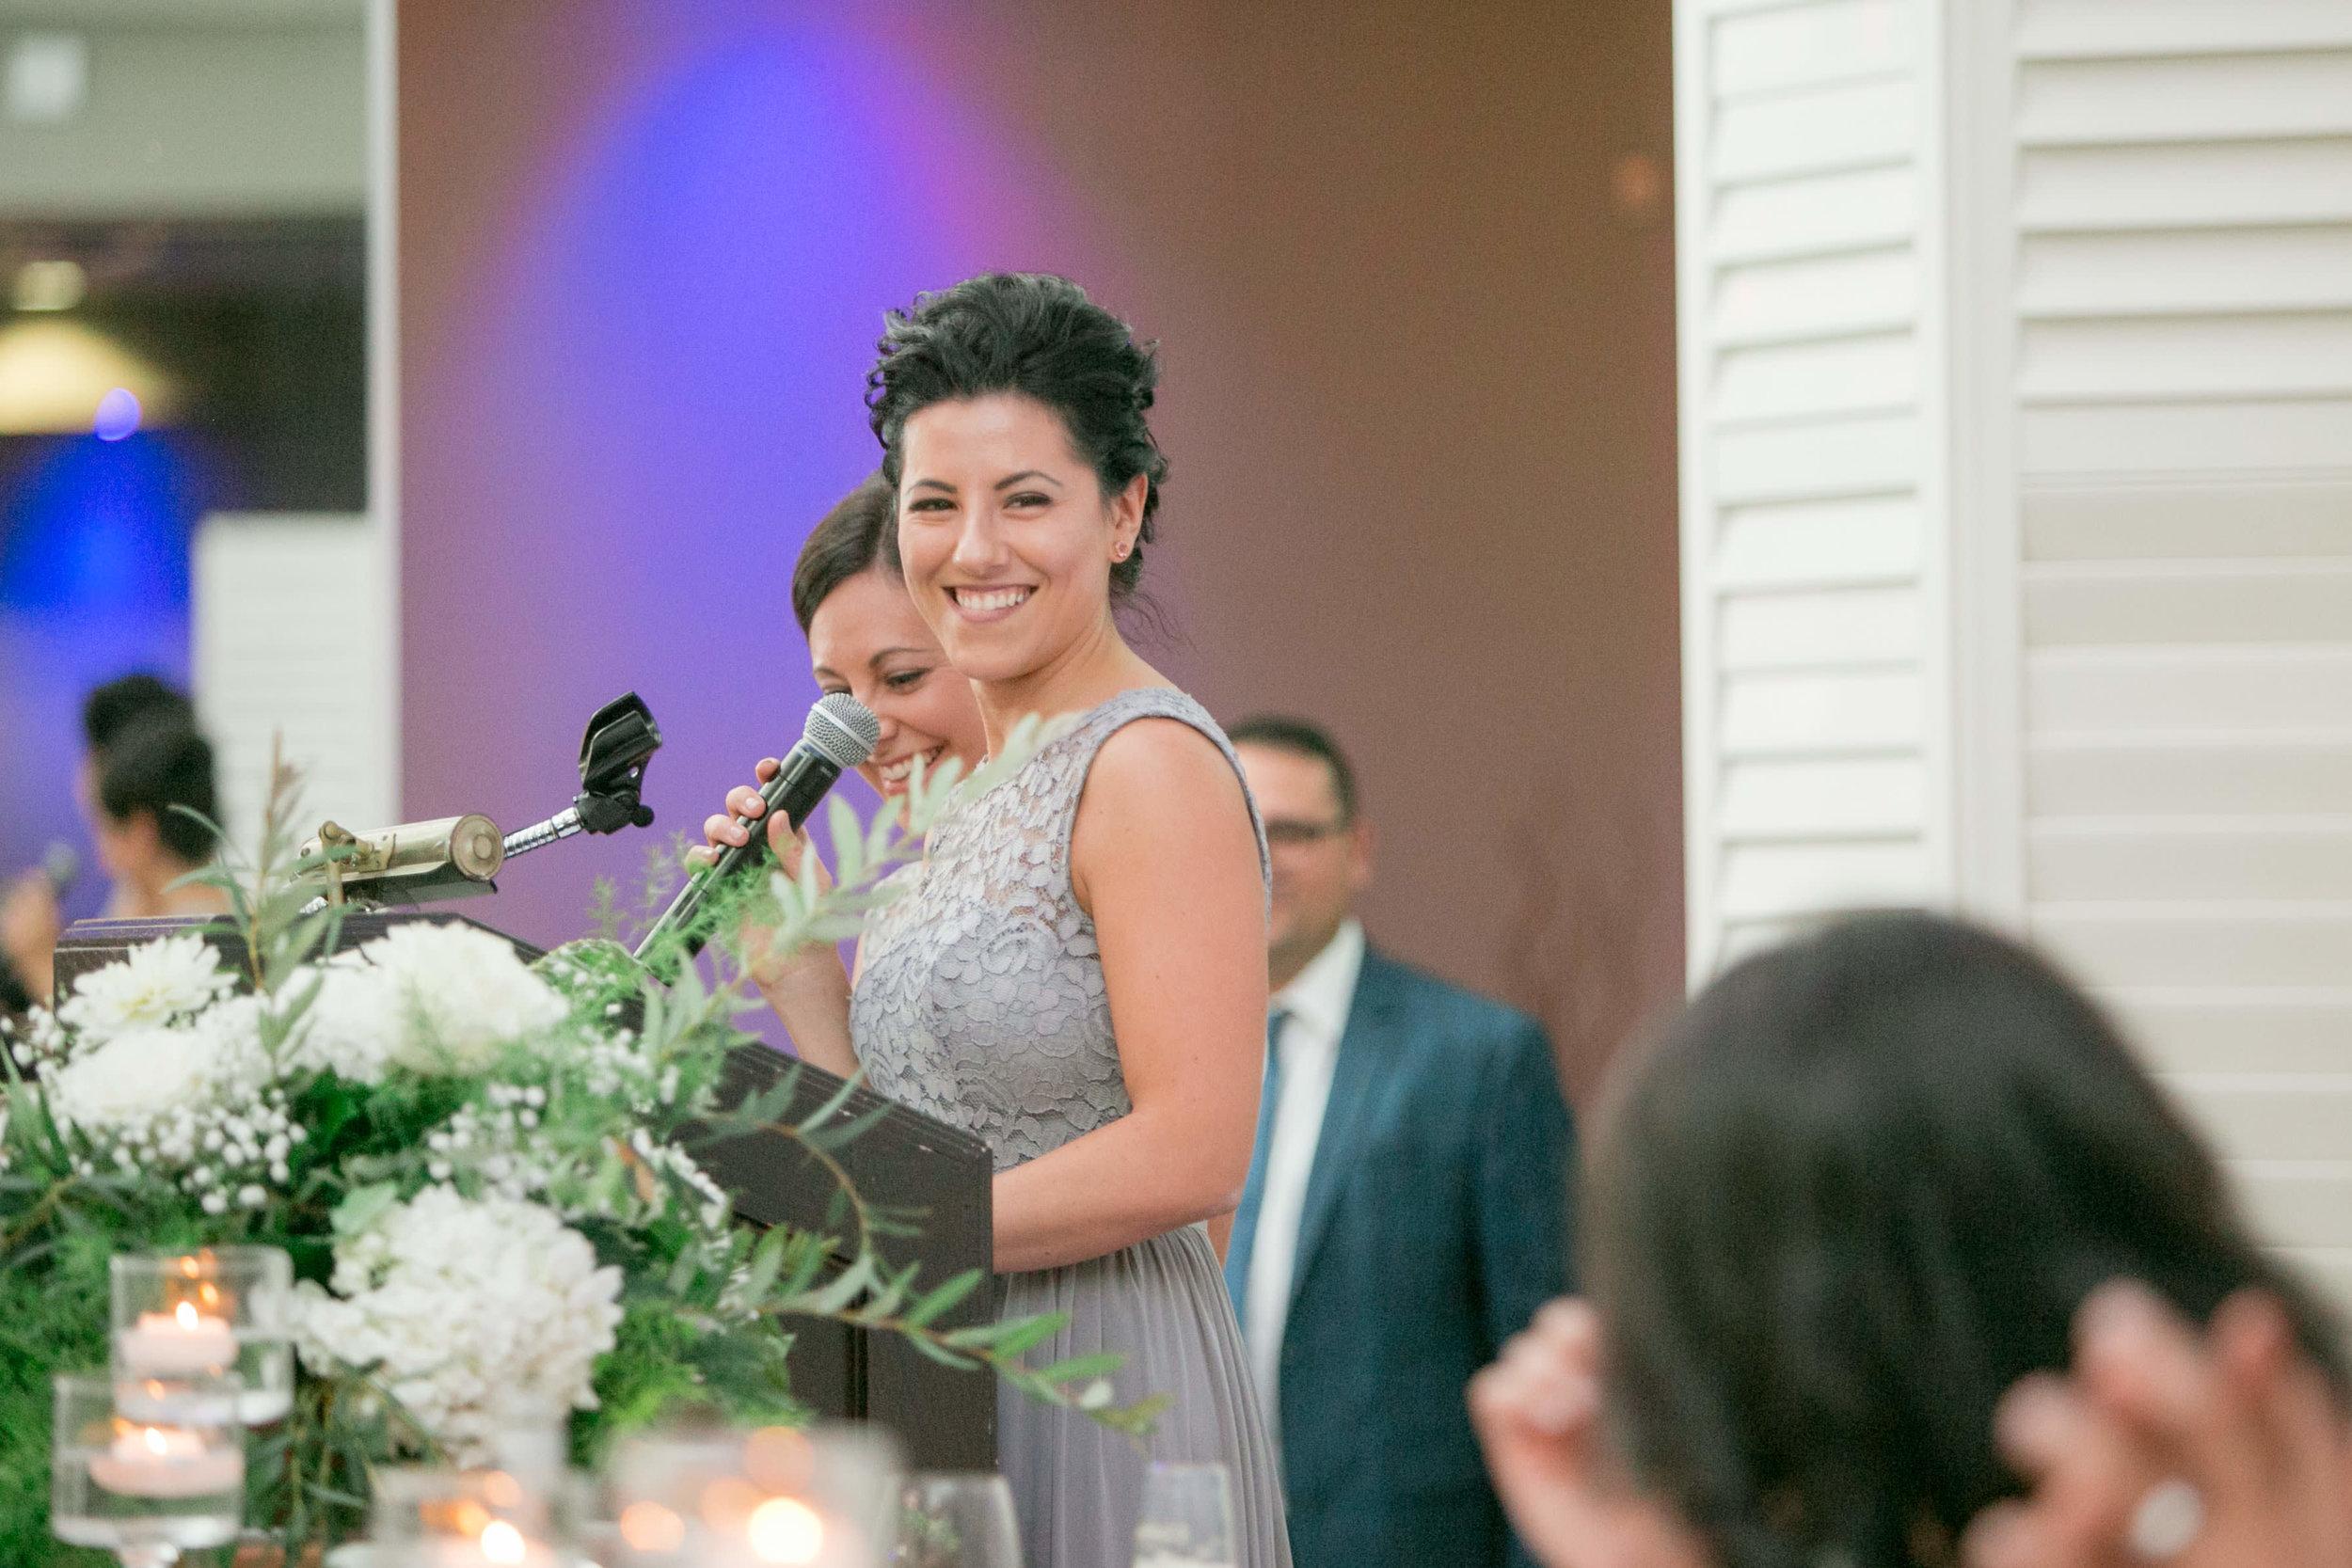 Stefanie___Bernard___Daniel_Ricci_Weddings_High_Res._Finals__566.jpg